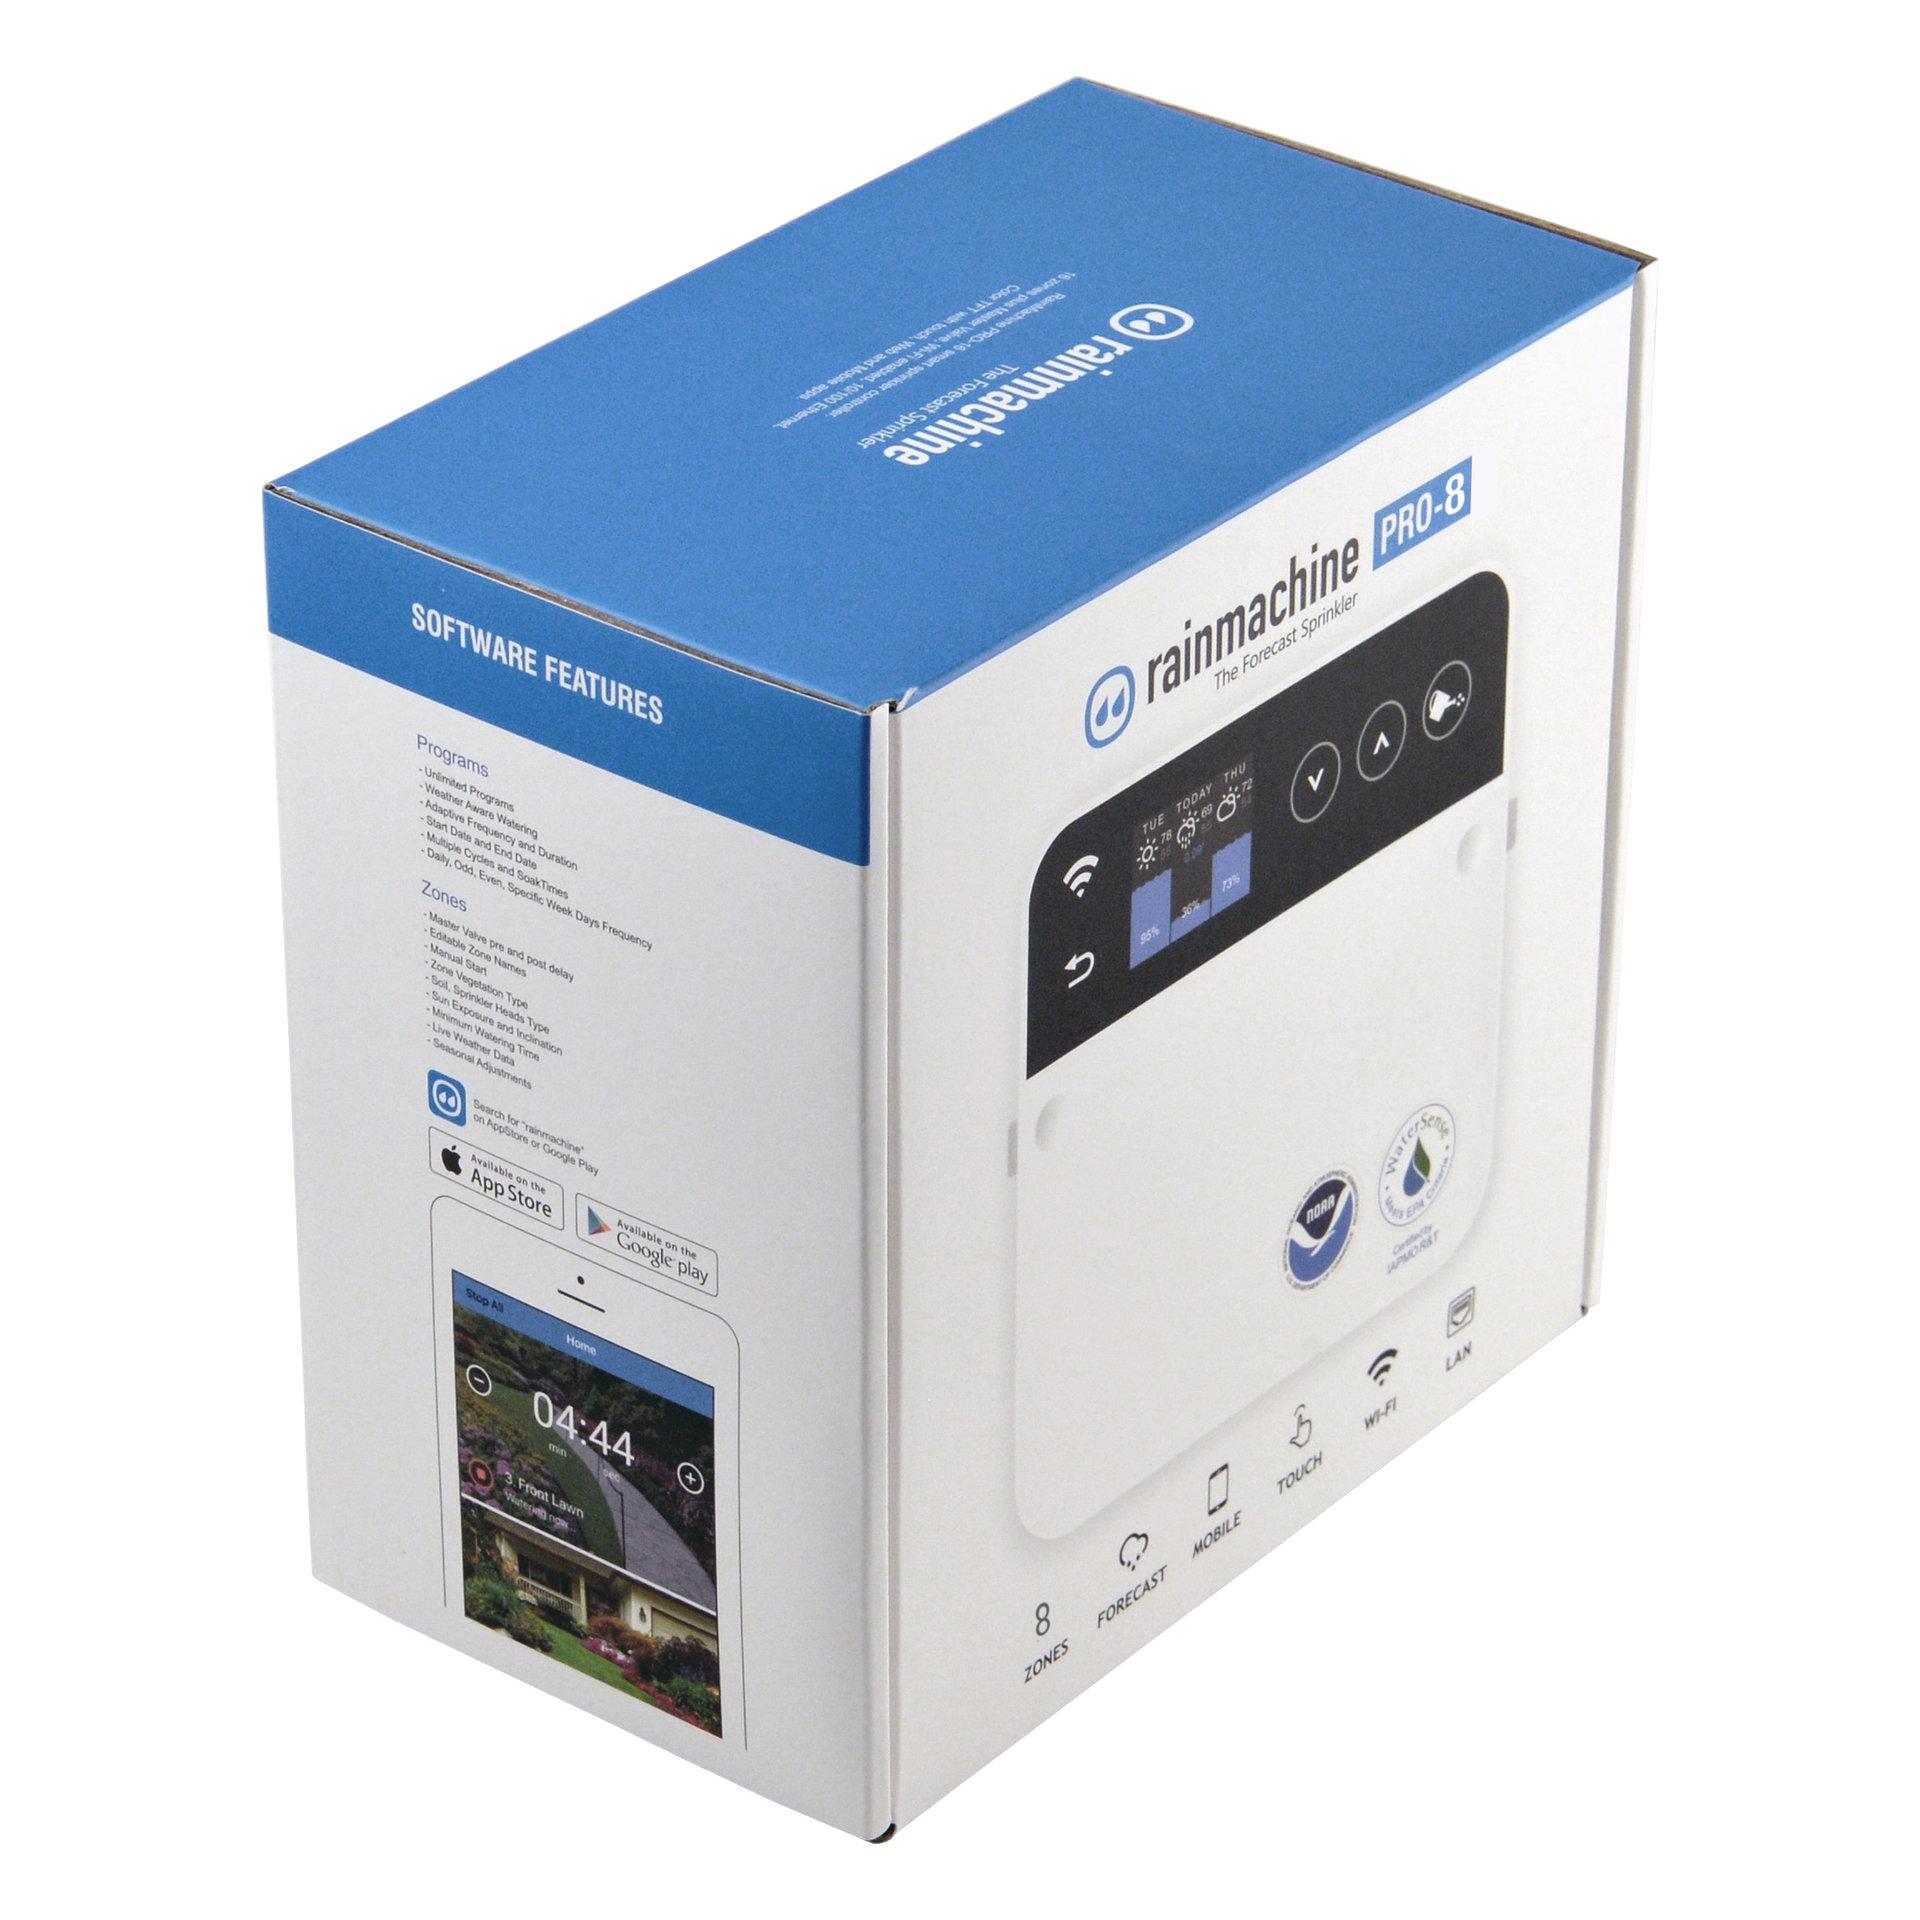 RainMachine Pro-8 Смарт контролер за поливни системи с WiFi & LAN - 8 зони